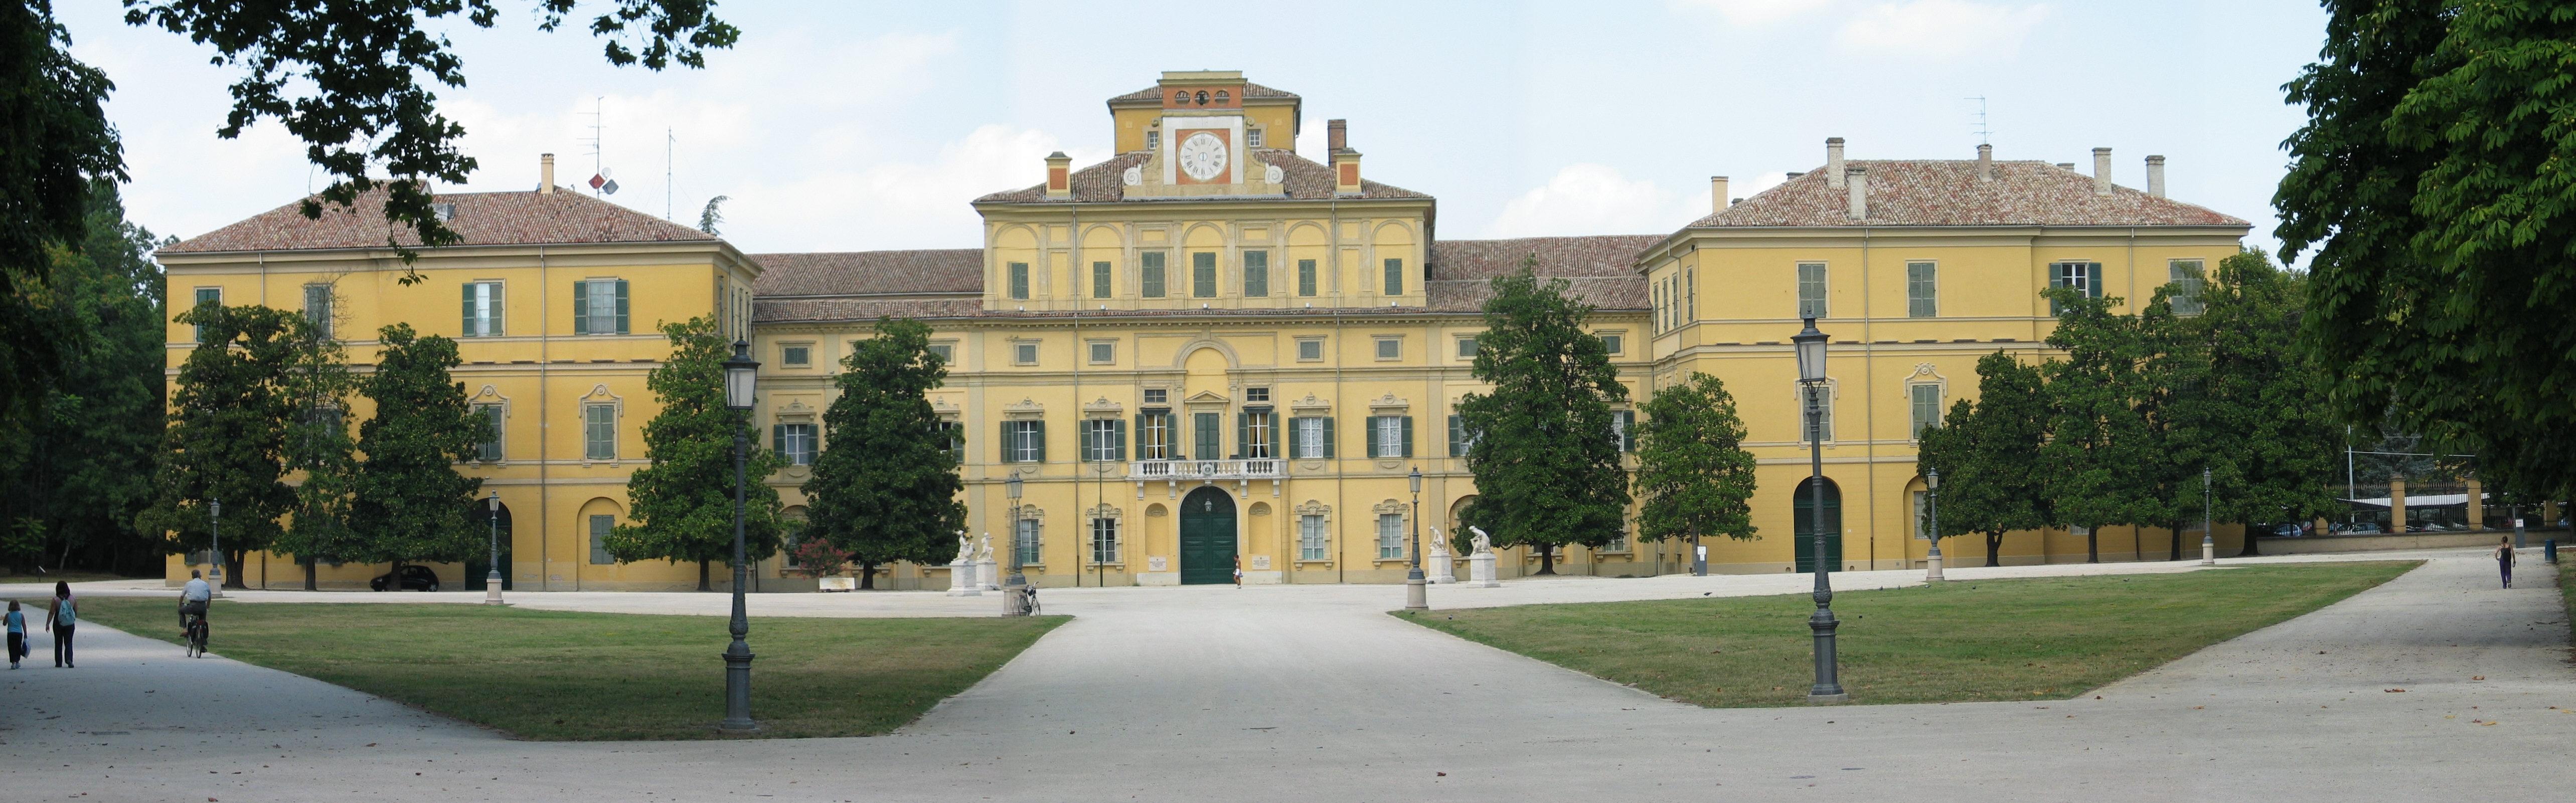 Fichier:Palazzo ducale.jpg — Wikipédia